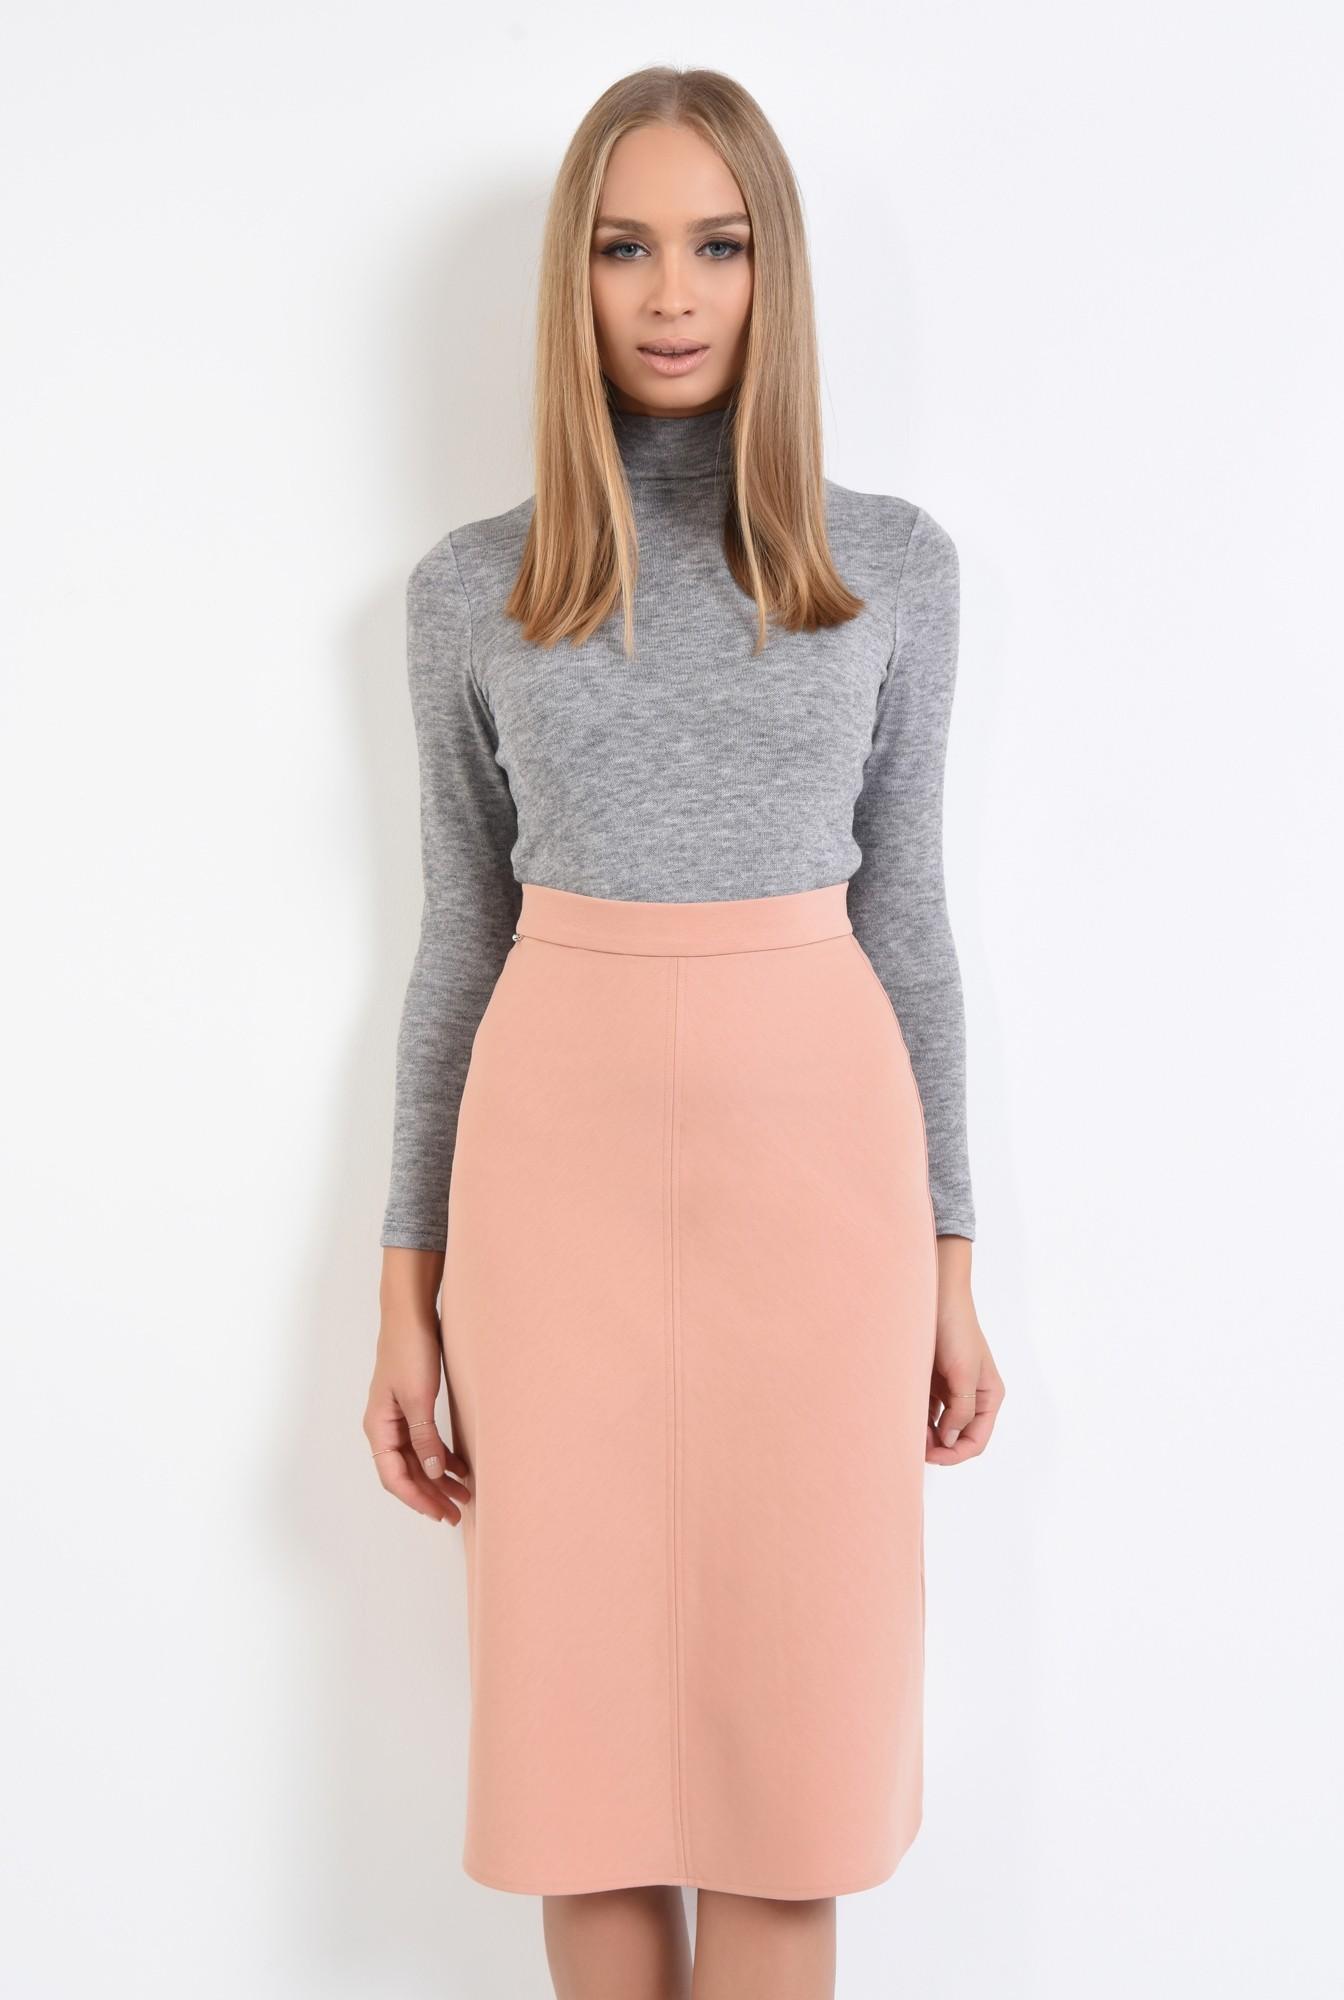 2 - fusta casual, roz, piersica, talie inalta